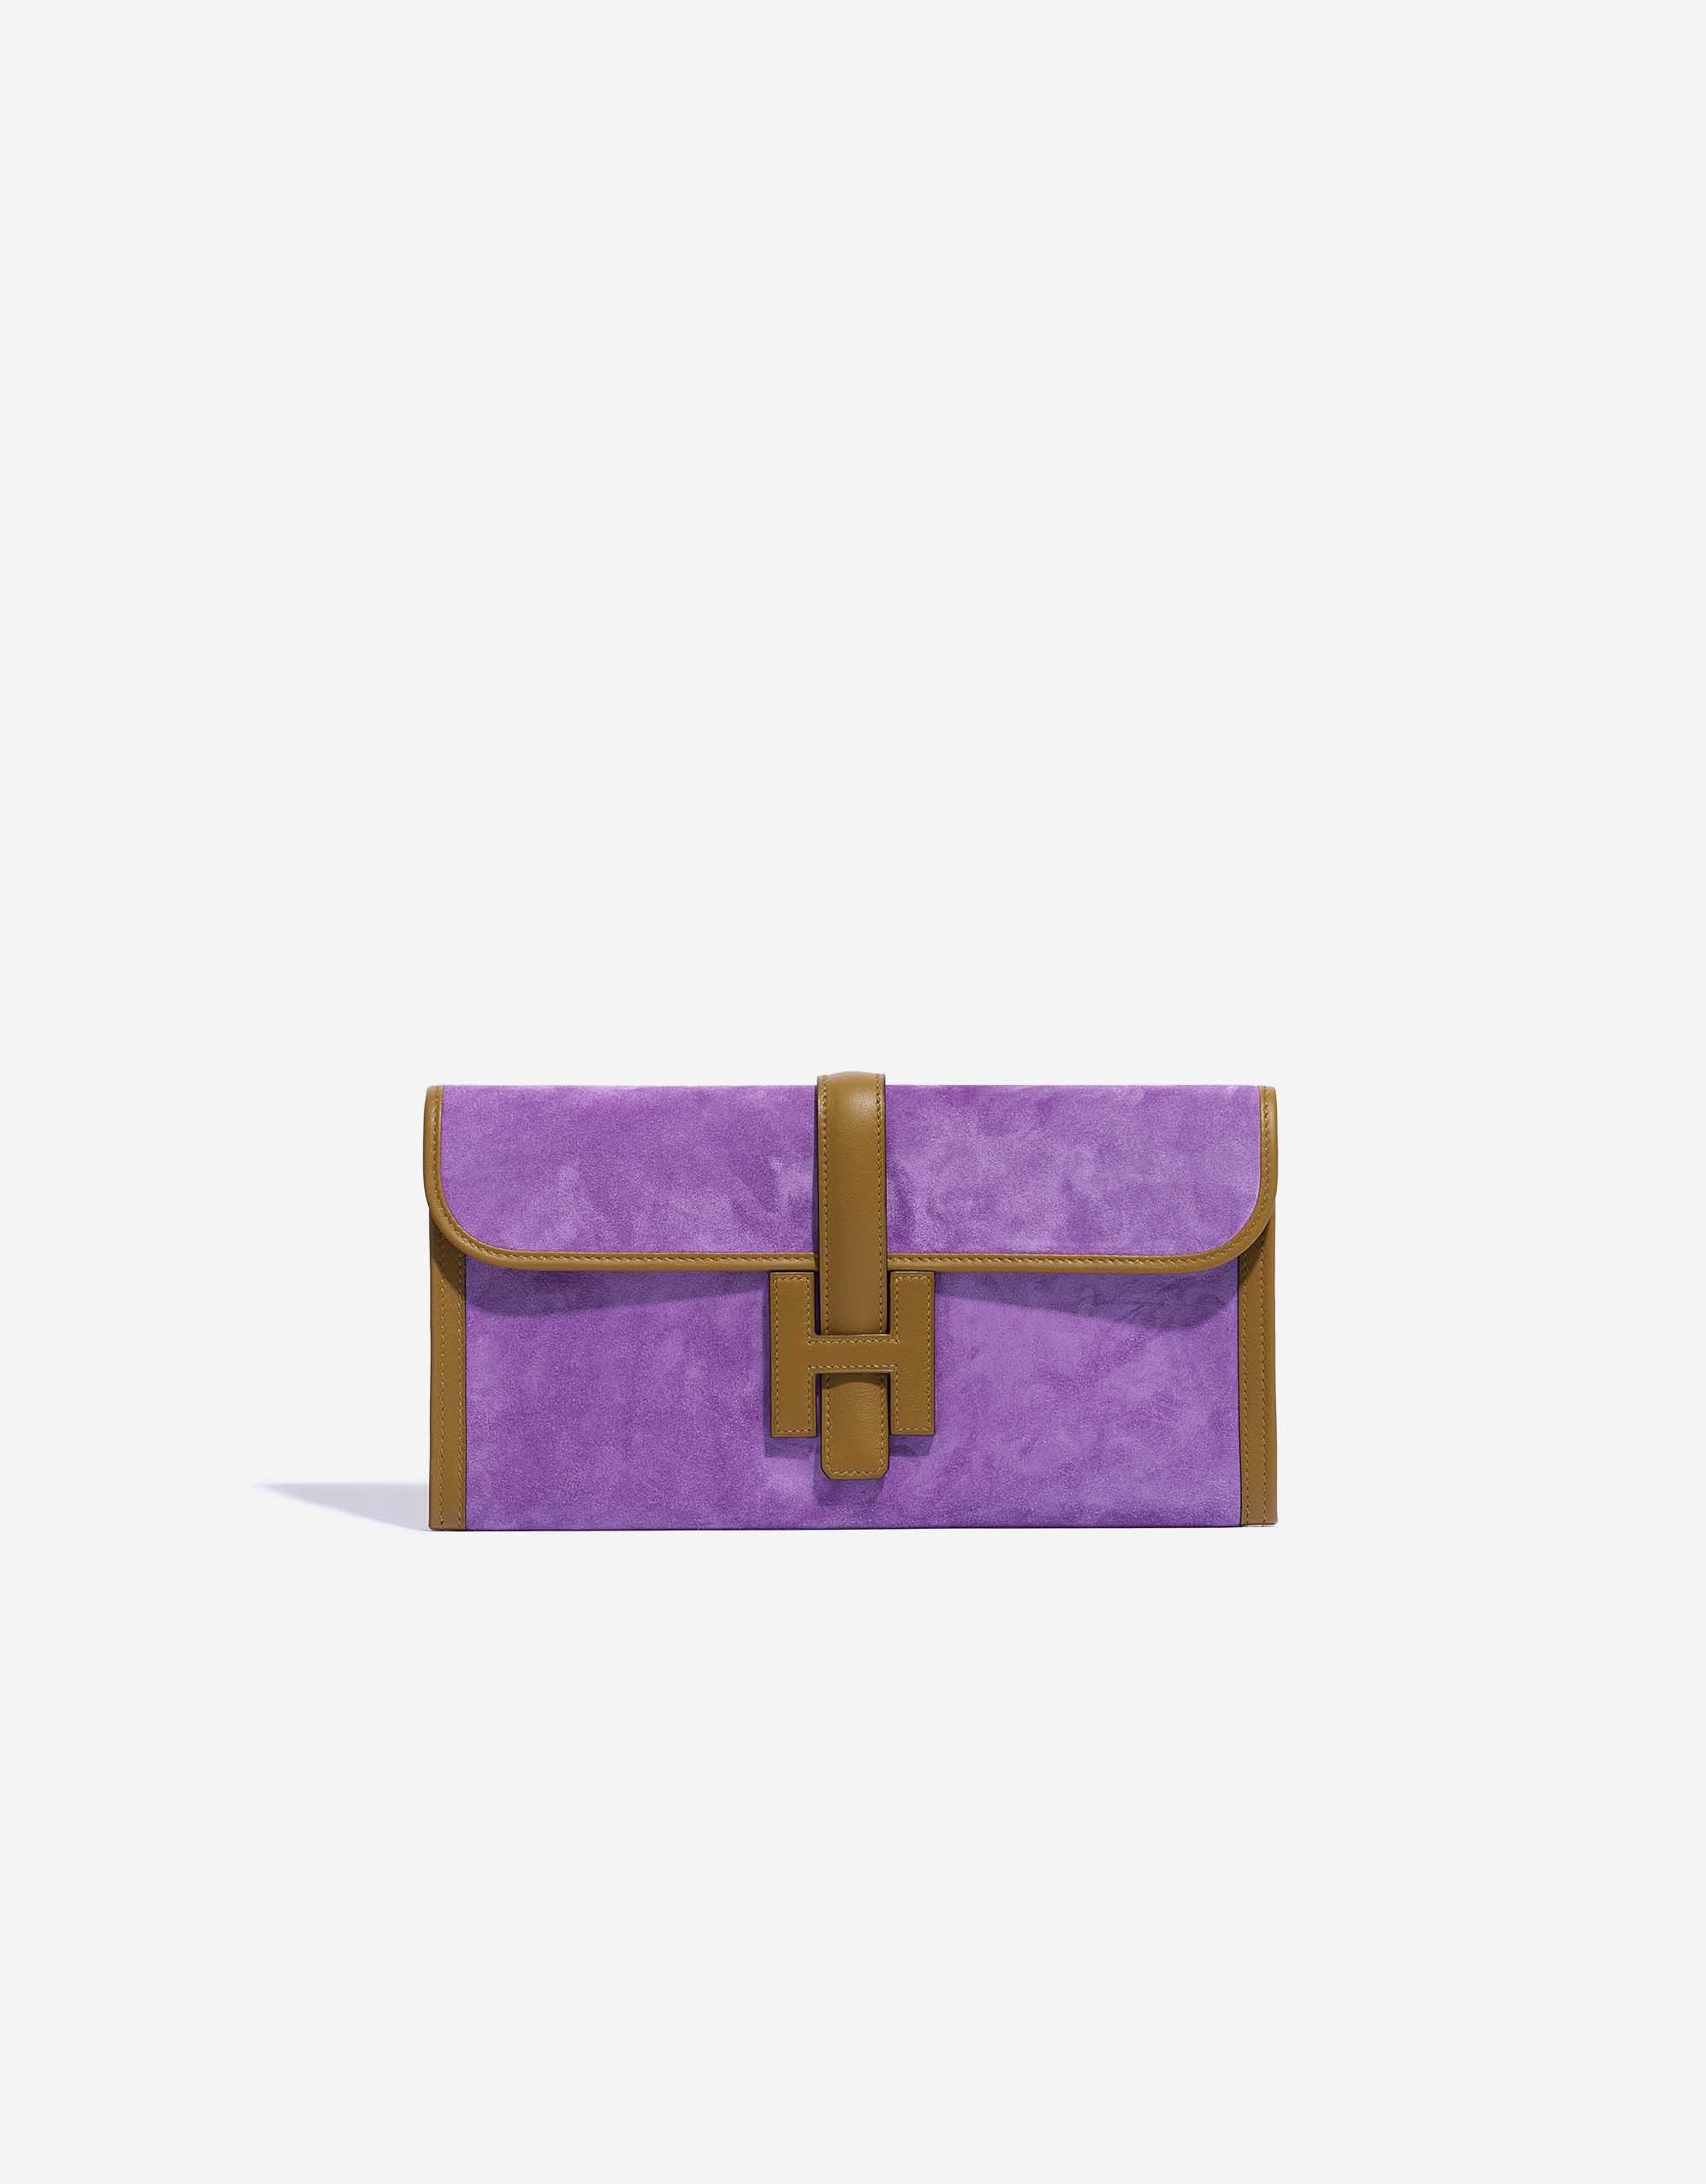 Hermès Jige 29 Doblis / Swift Violet Clair / Kraft | SACLÀB